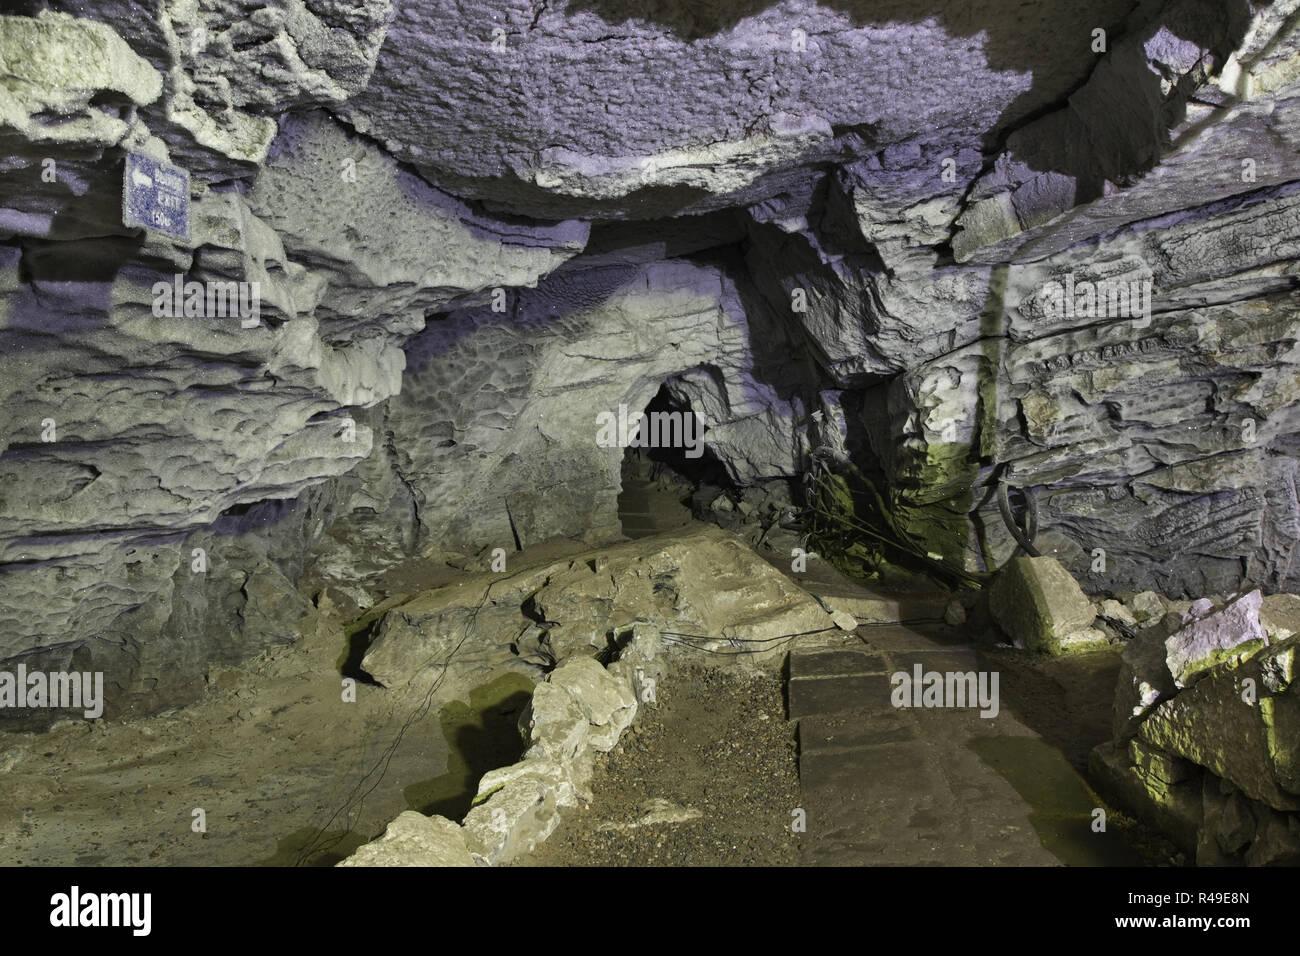 Kungur Ice Cave. Perm Krai. Russia - Stock Image